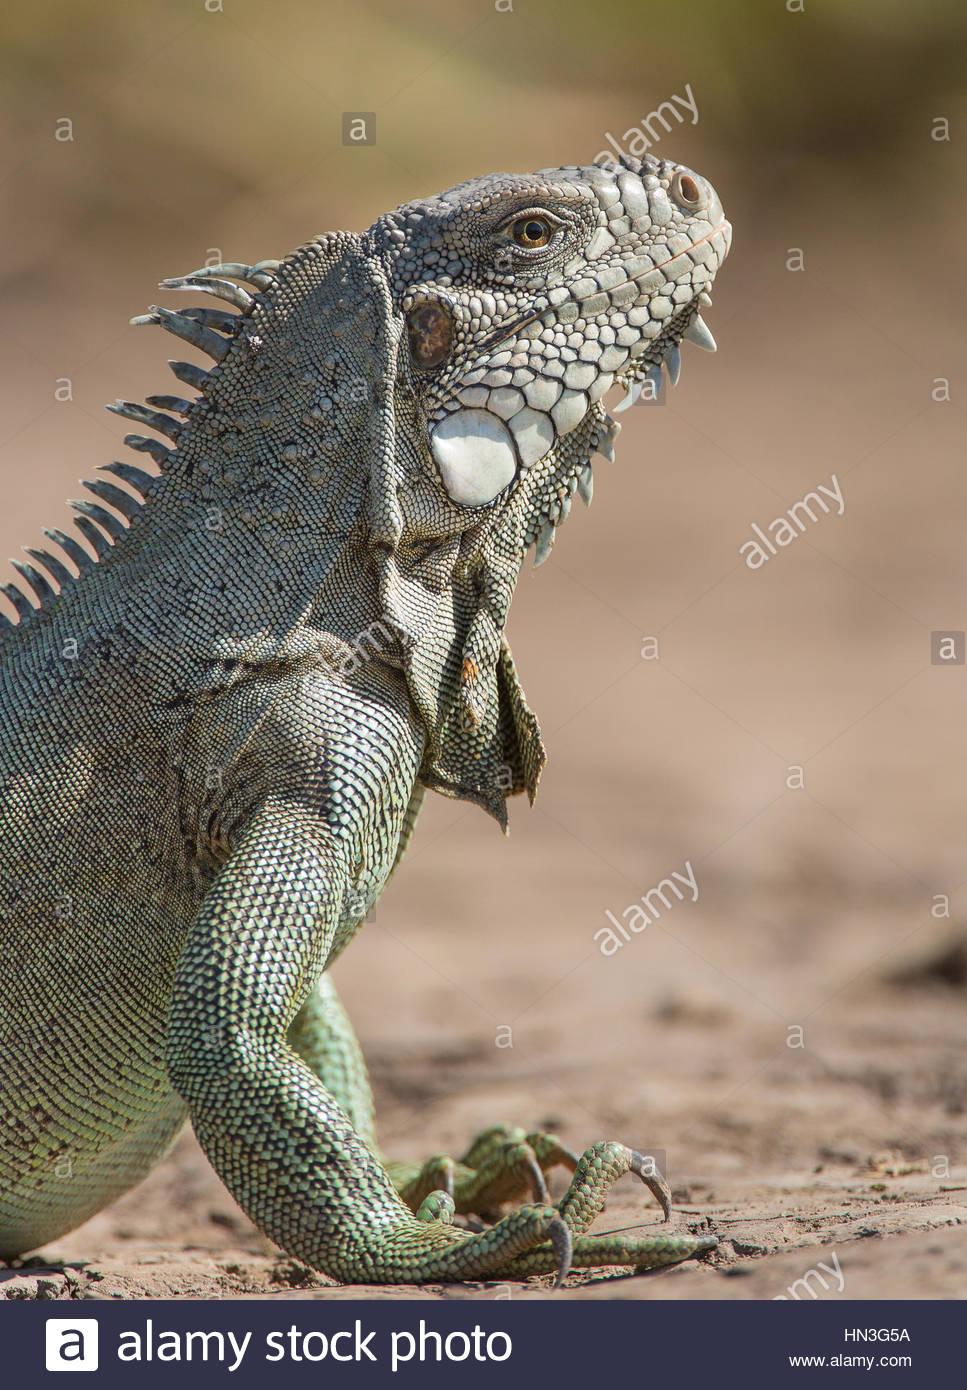 Portrait of a green iguana, Iguana iguana, along the Cuiaba River. Stock Photo